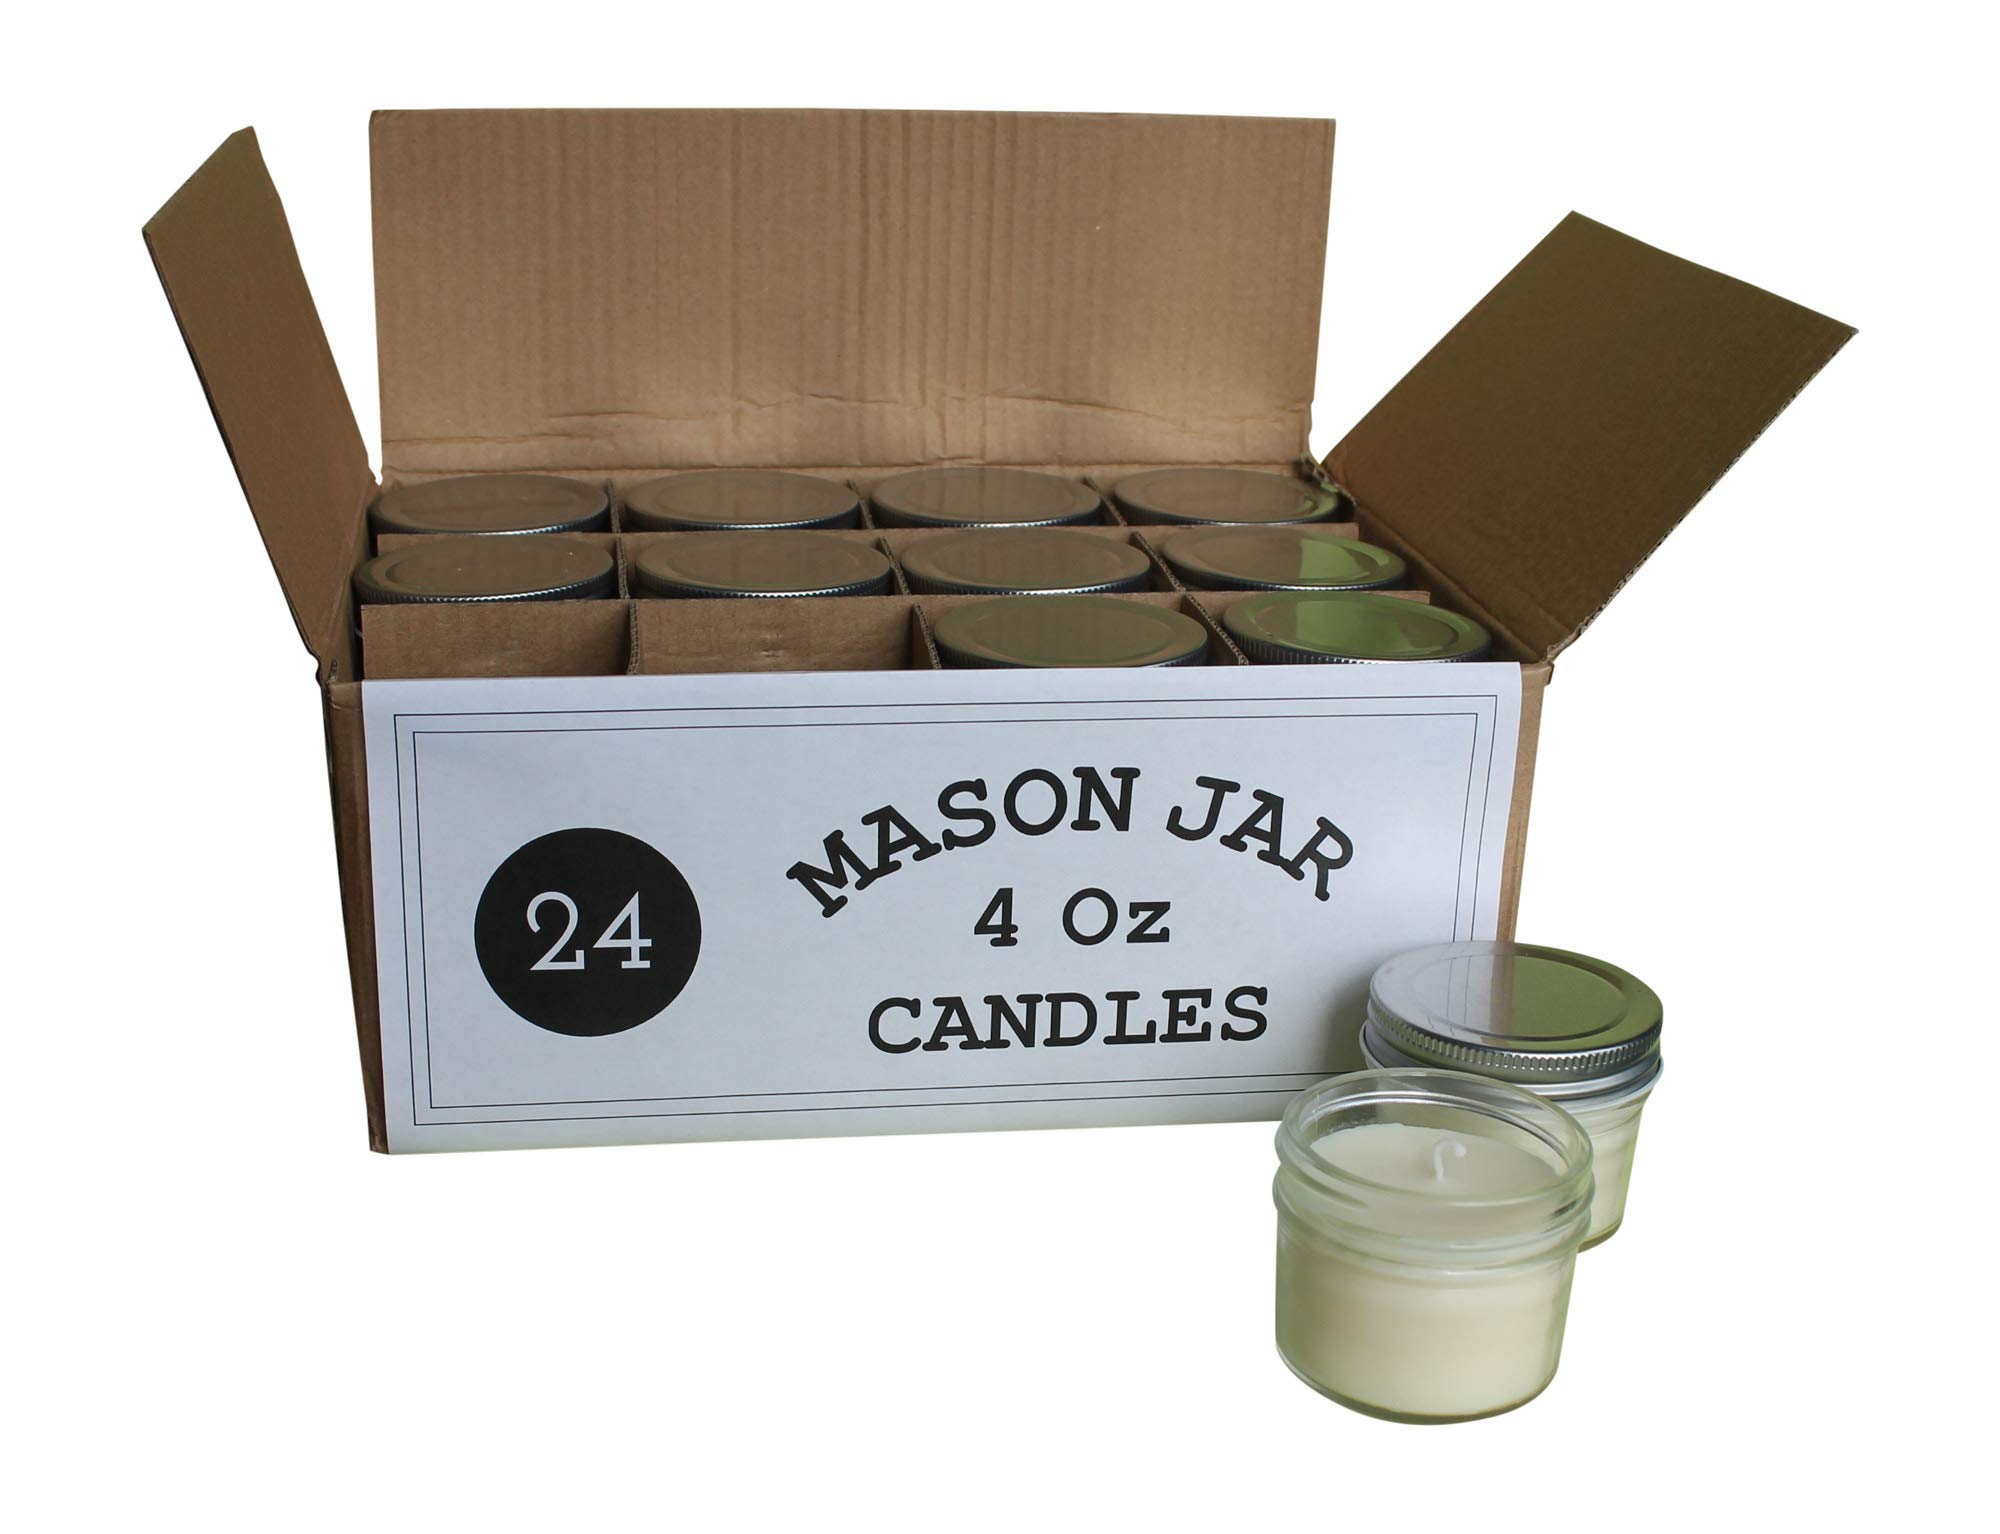 Set of 24 Bulk Wholesale Mini Mason Jar Candles - 4 Ounce - Perfect for Weddings, Restaurants, Gifts, Baby Showers by Mason Jar Warehouse